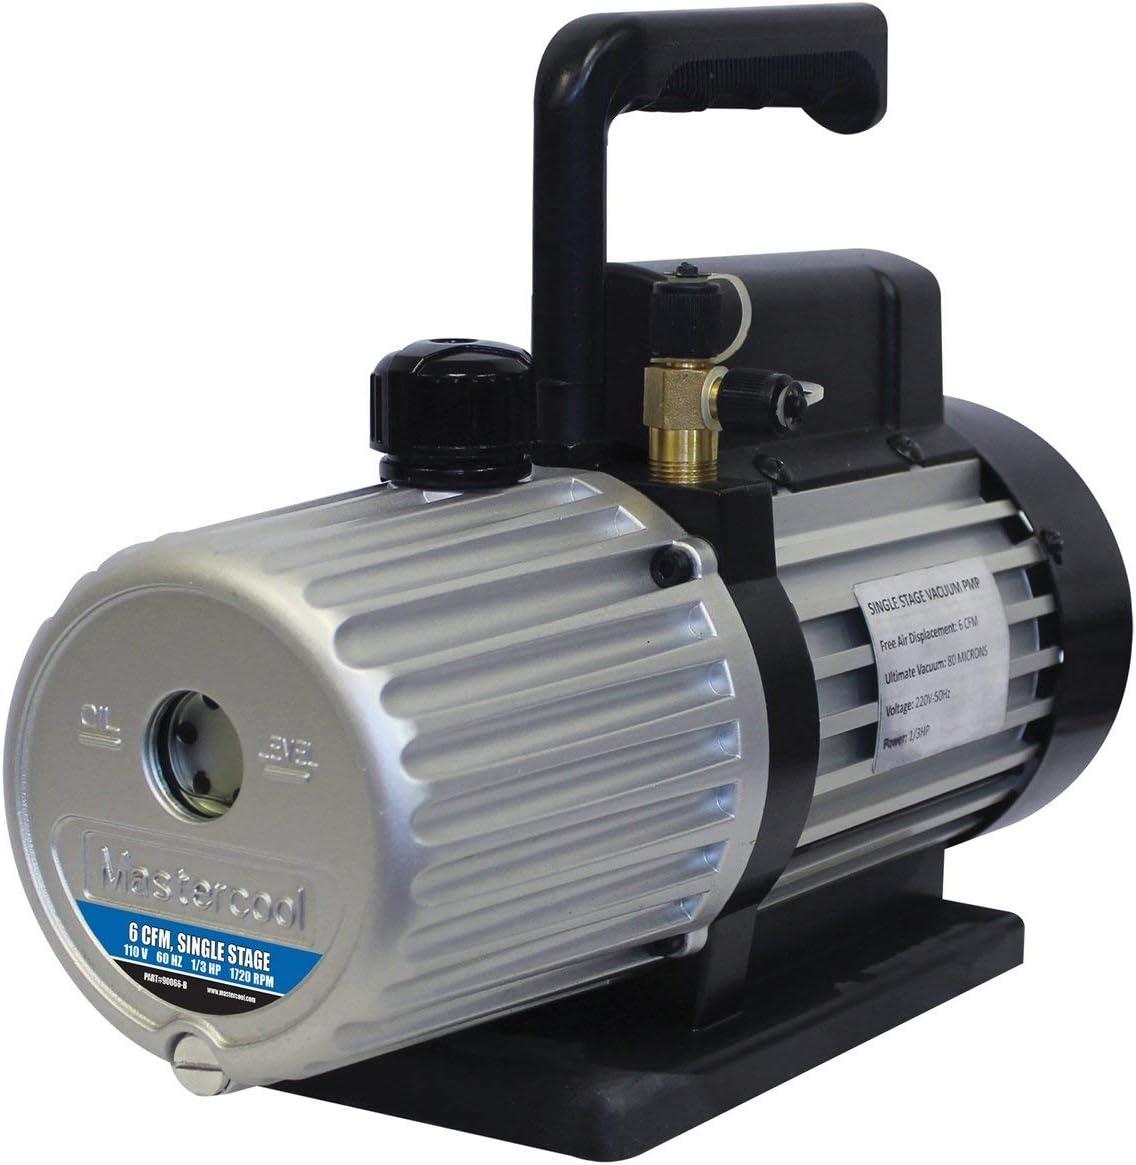 Mastercool MSC90066-B-SF Vacuum Pump (Spark Free 6 Cfm For 1234Yf Systems), 1 Pack